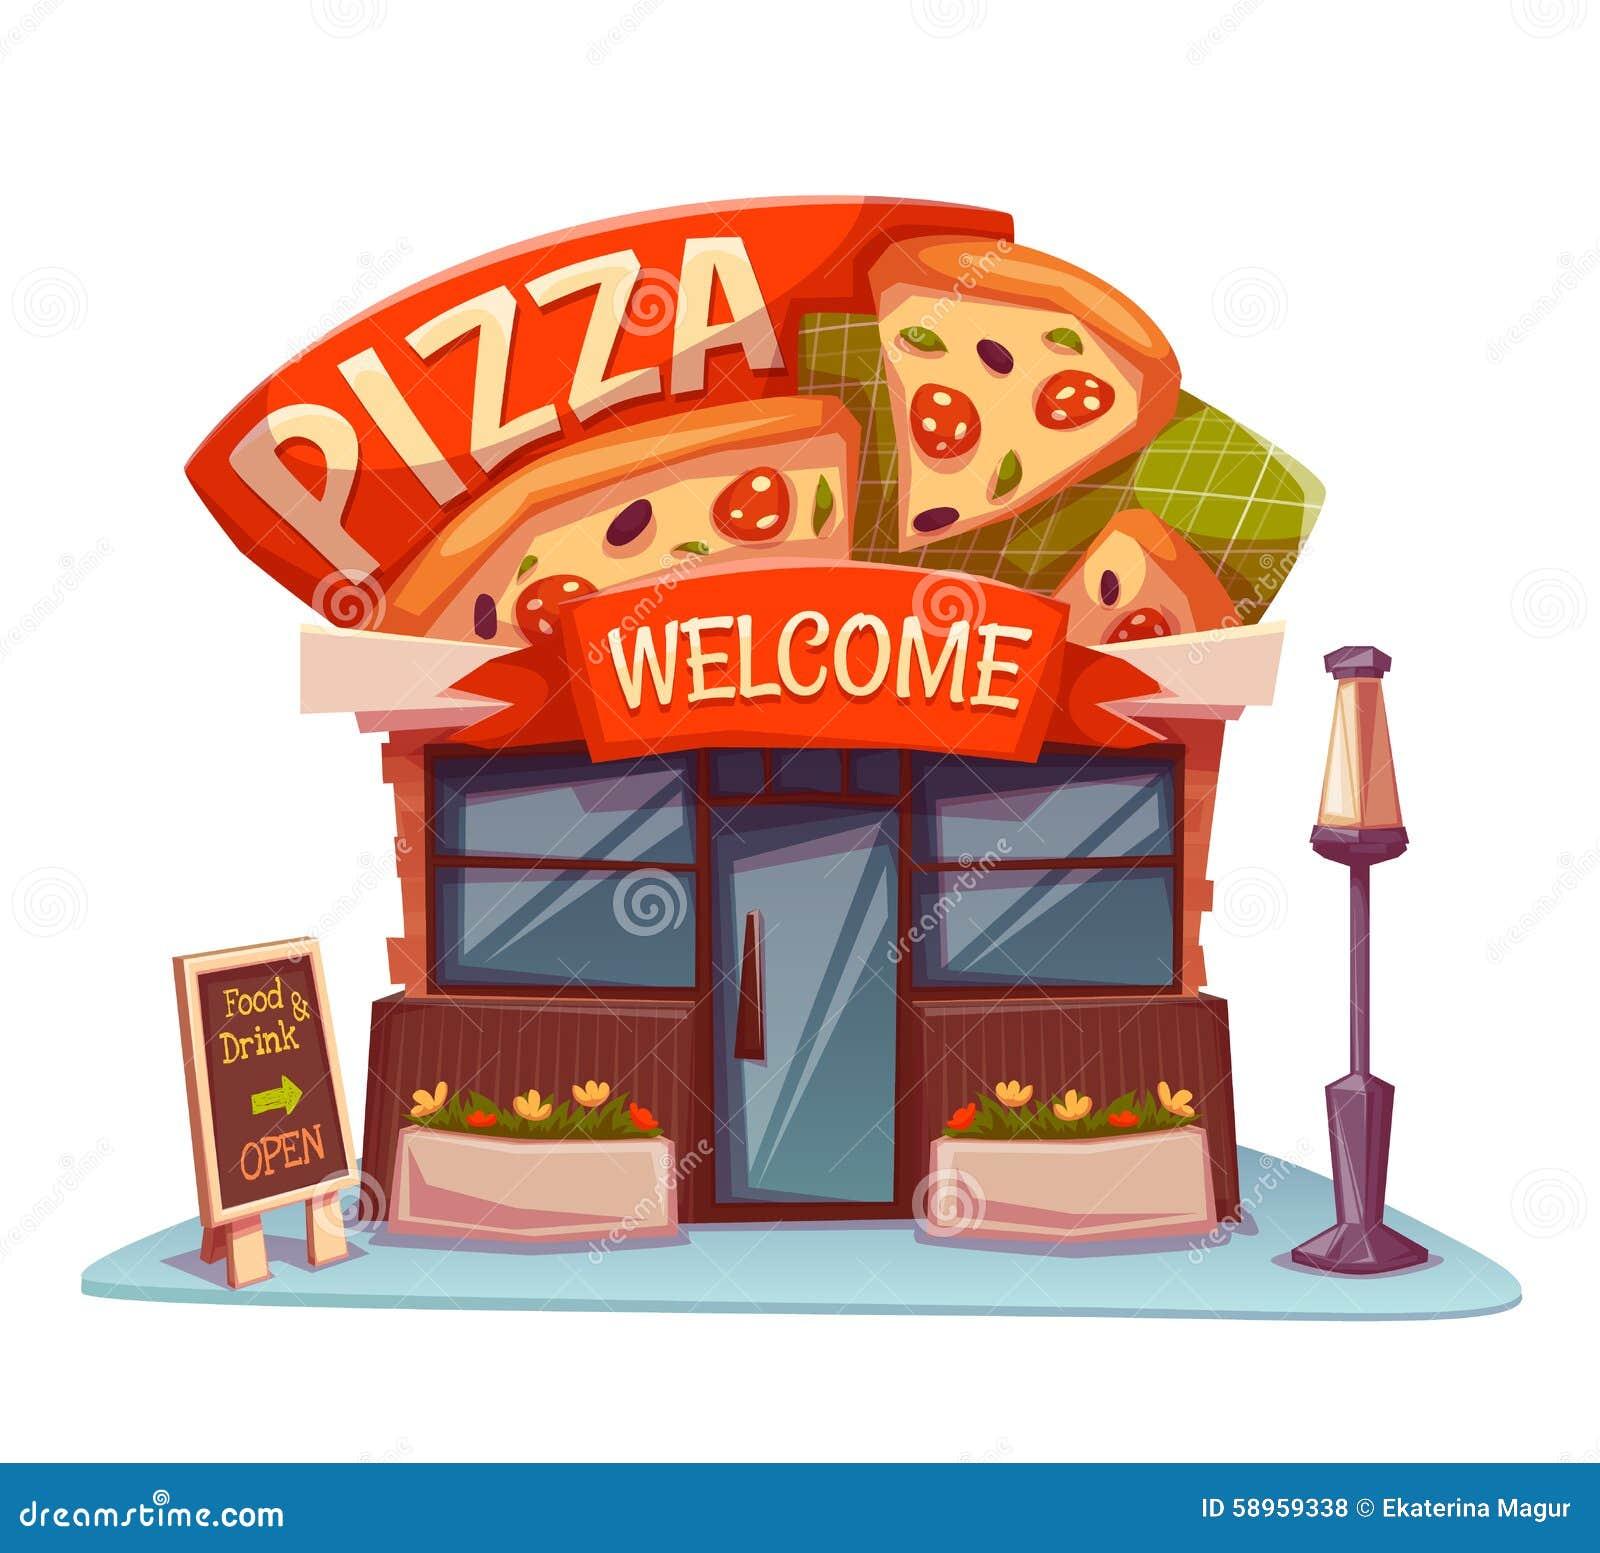 Building cartoon clipart restaurant building and restaurant building - Royalty Free Vector Download Pizzeria Building